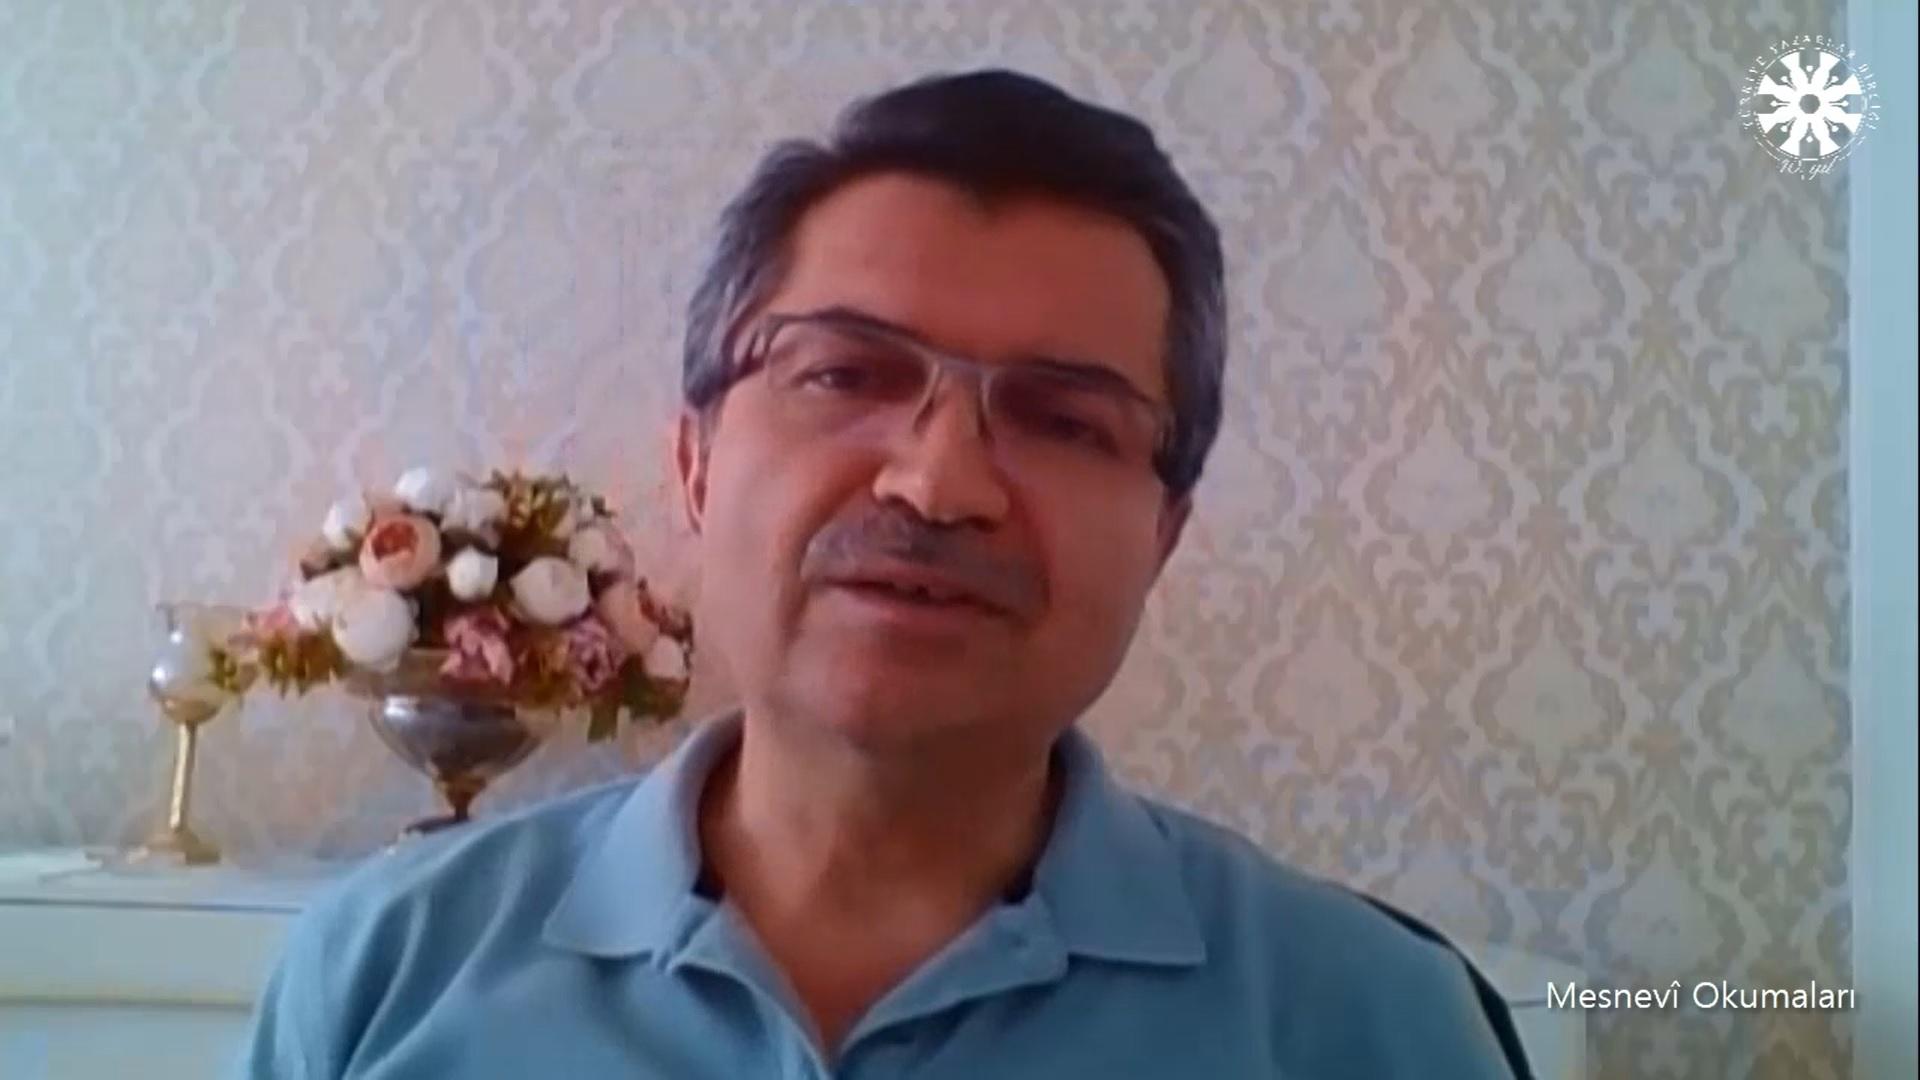 Mesnevî Okumaları -107- Dr. Fahrettin Coşguner